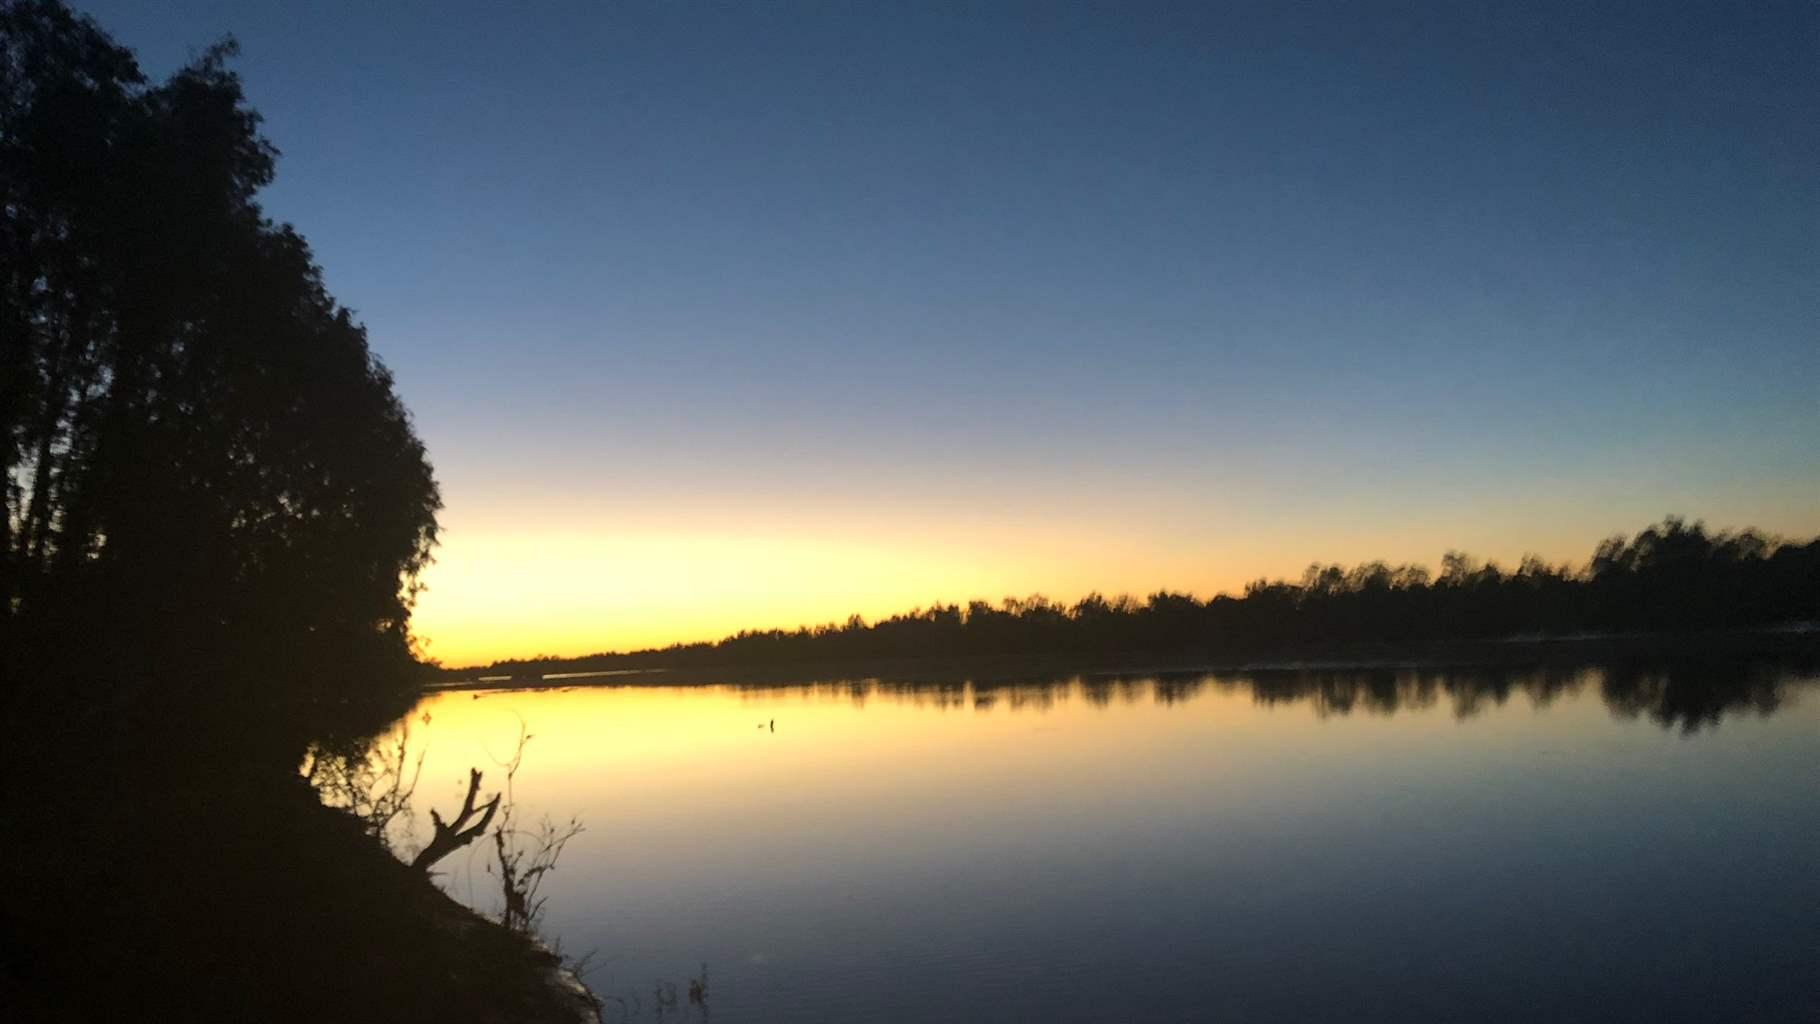 Margaret river in april